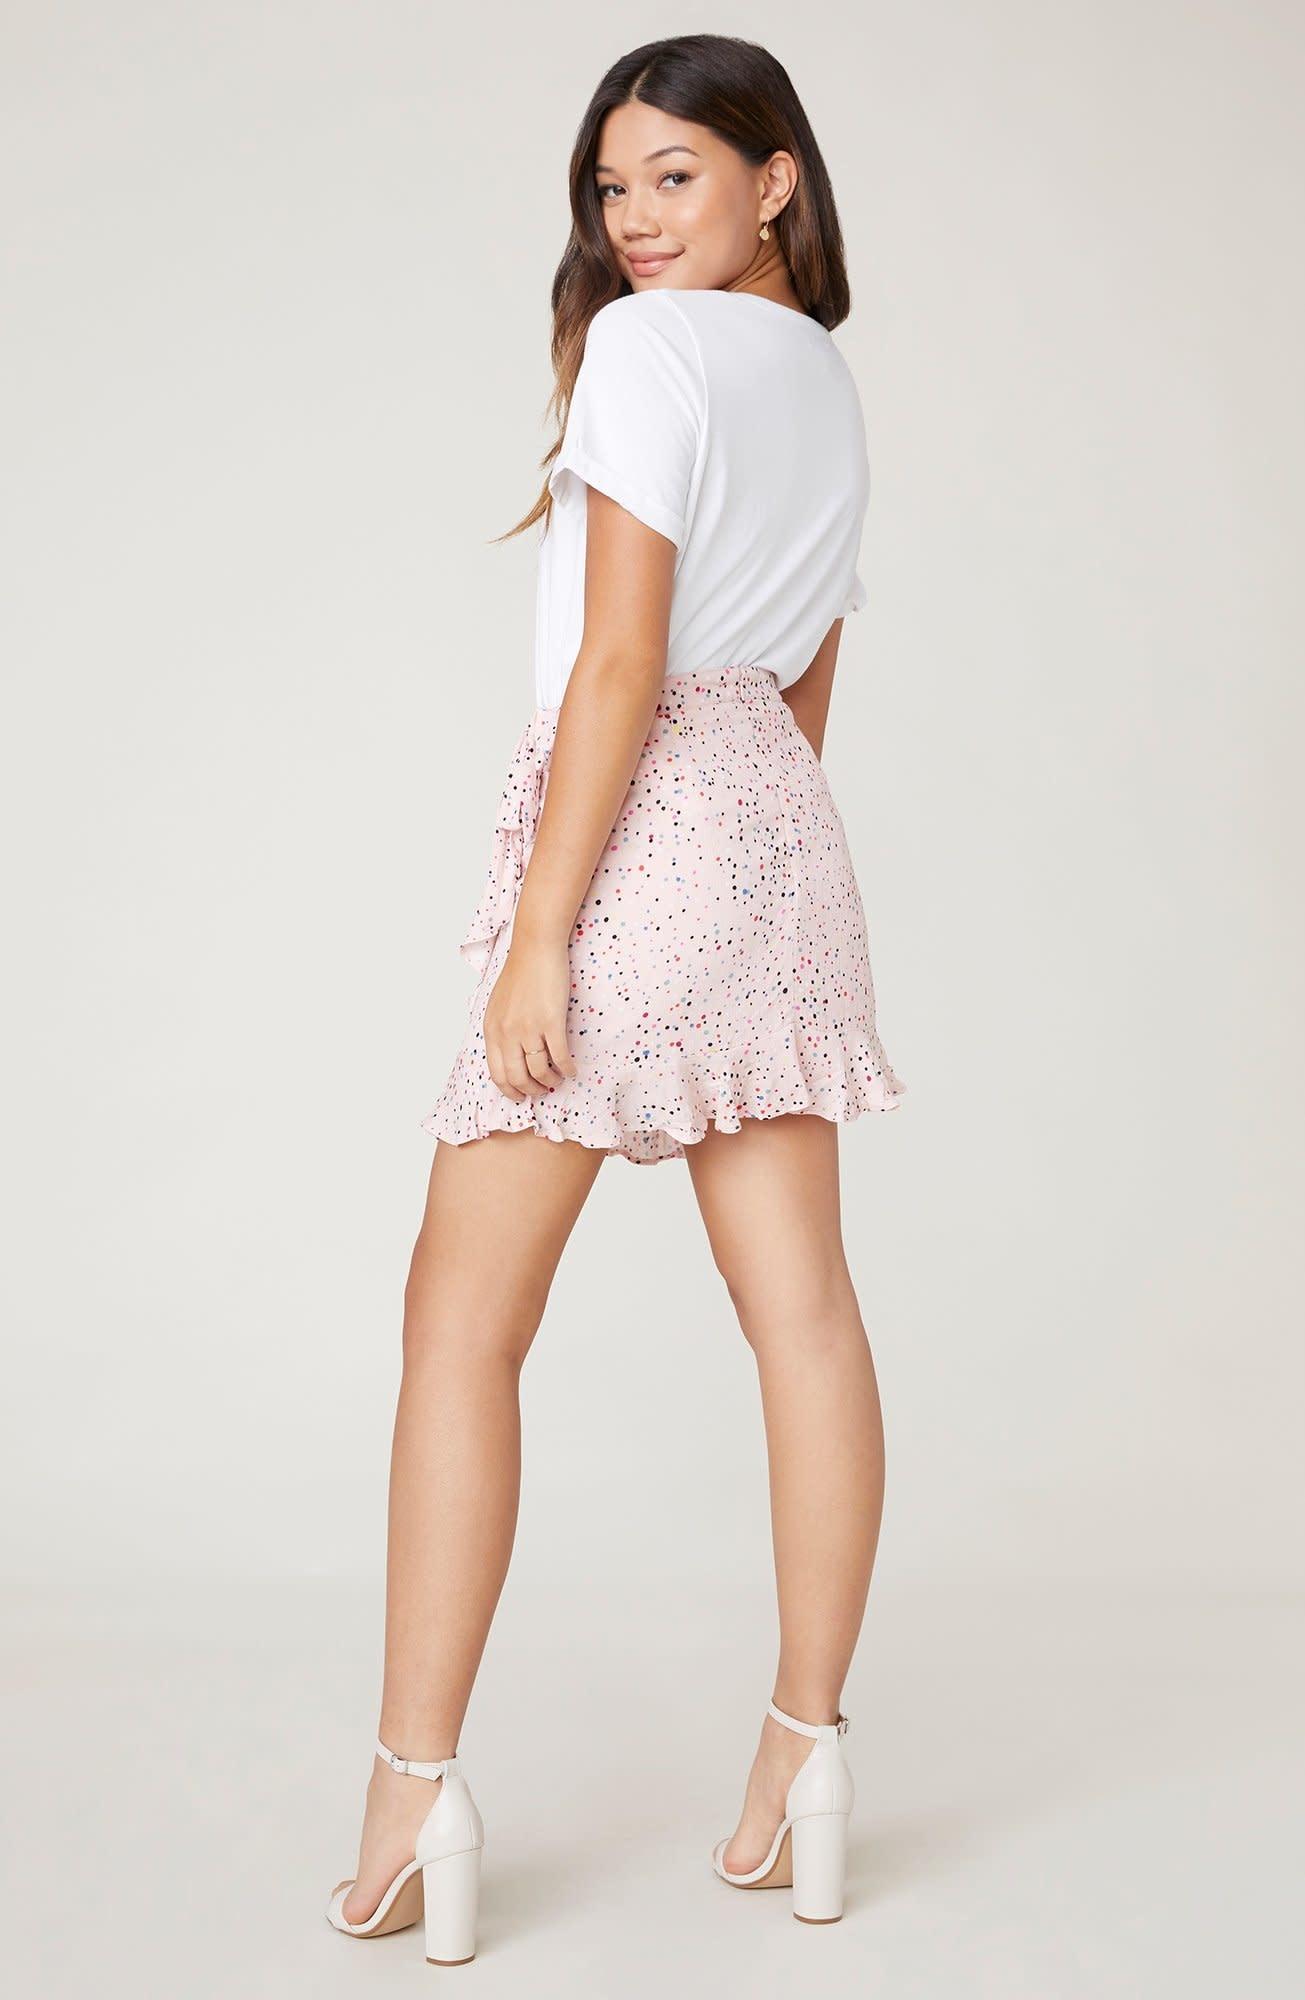 Jack by BB Dakota Reason To Party Wrap Skirt